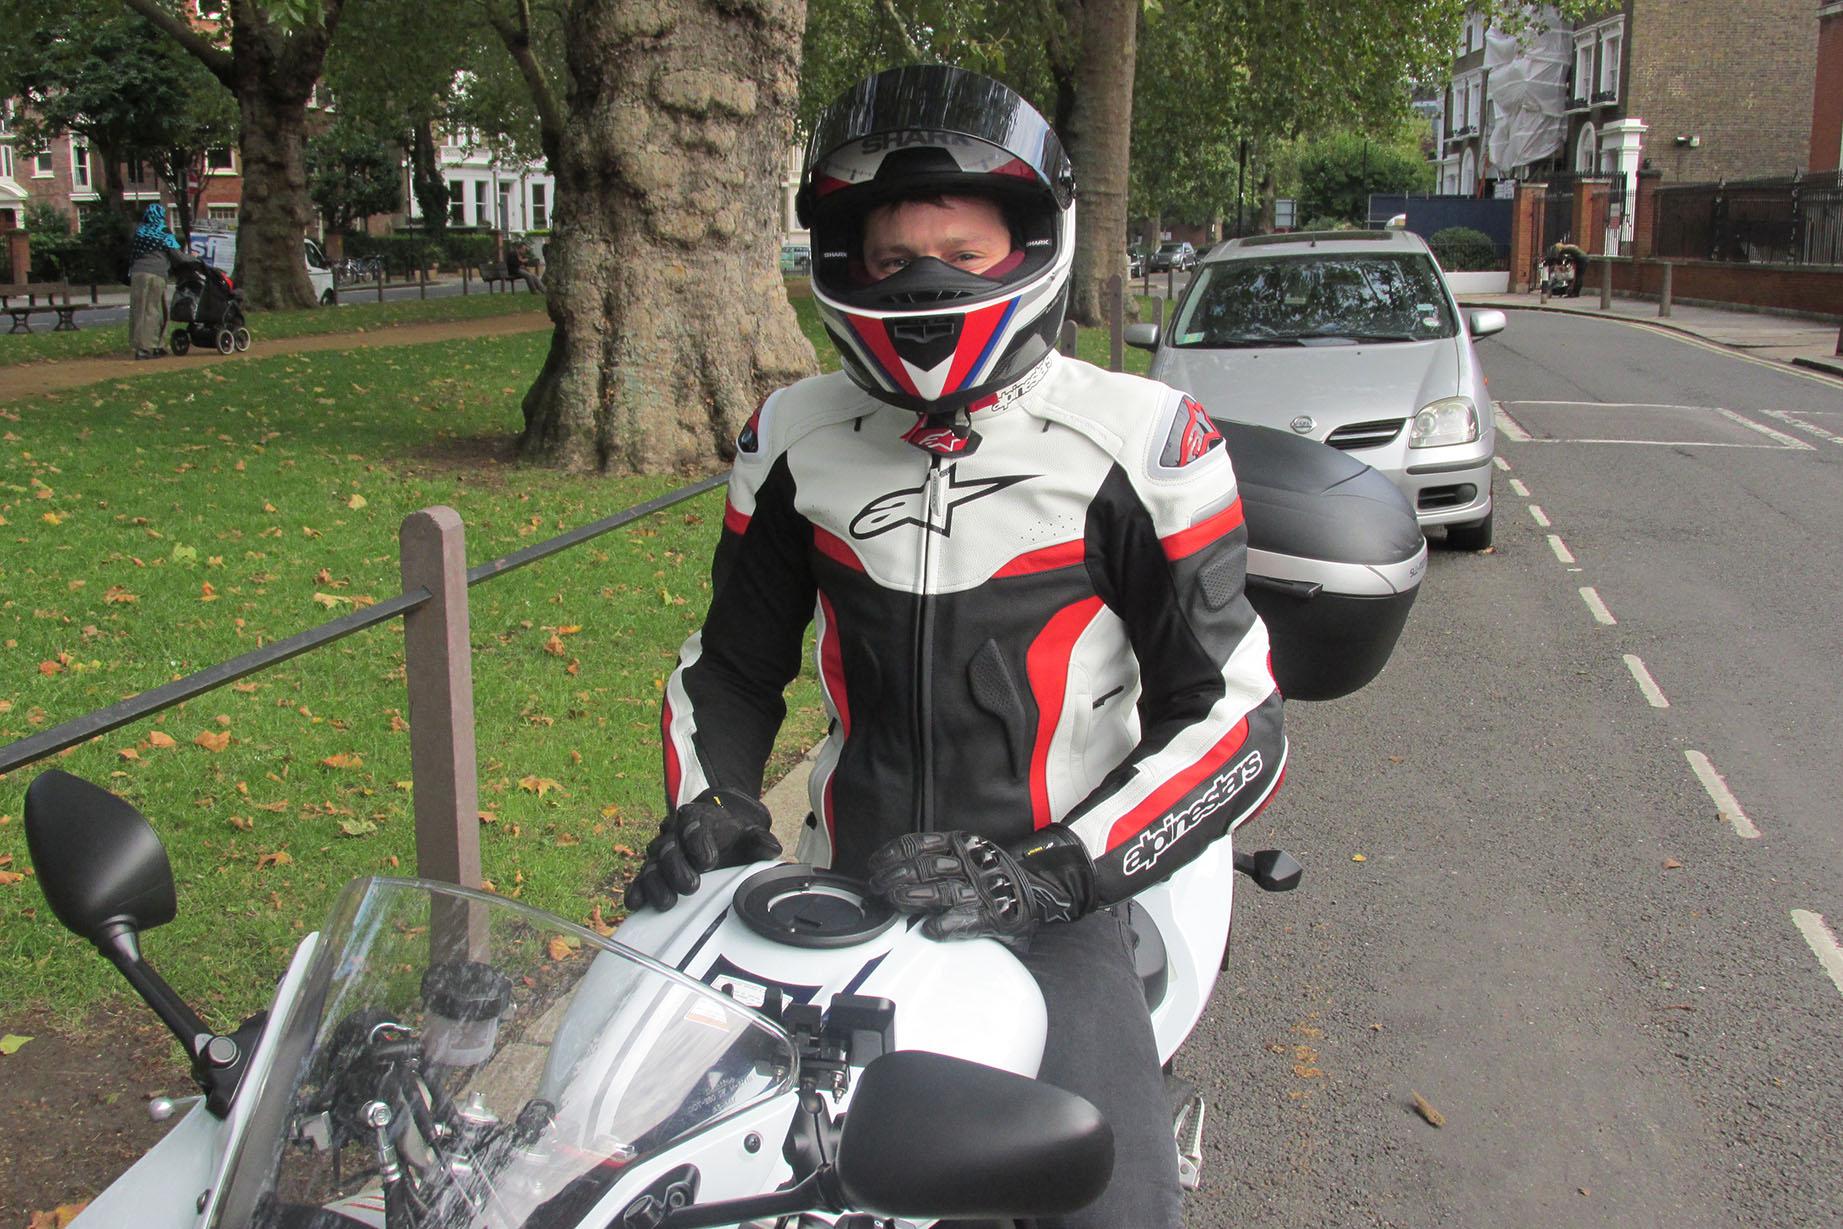 Alpinestars Jacket Leather >> Alpinestars Celer jacket – first impre... | Visordown